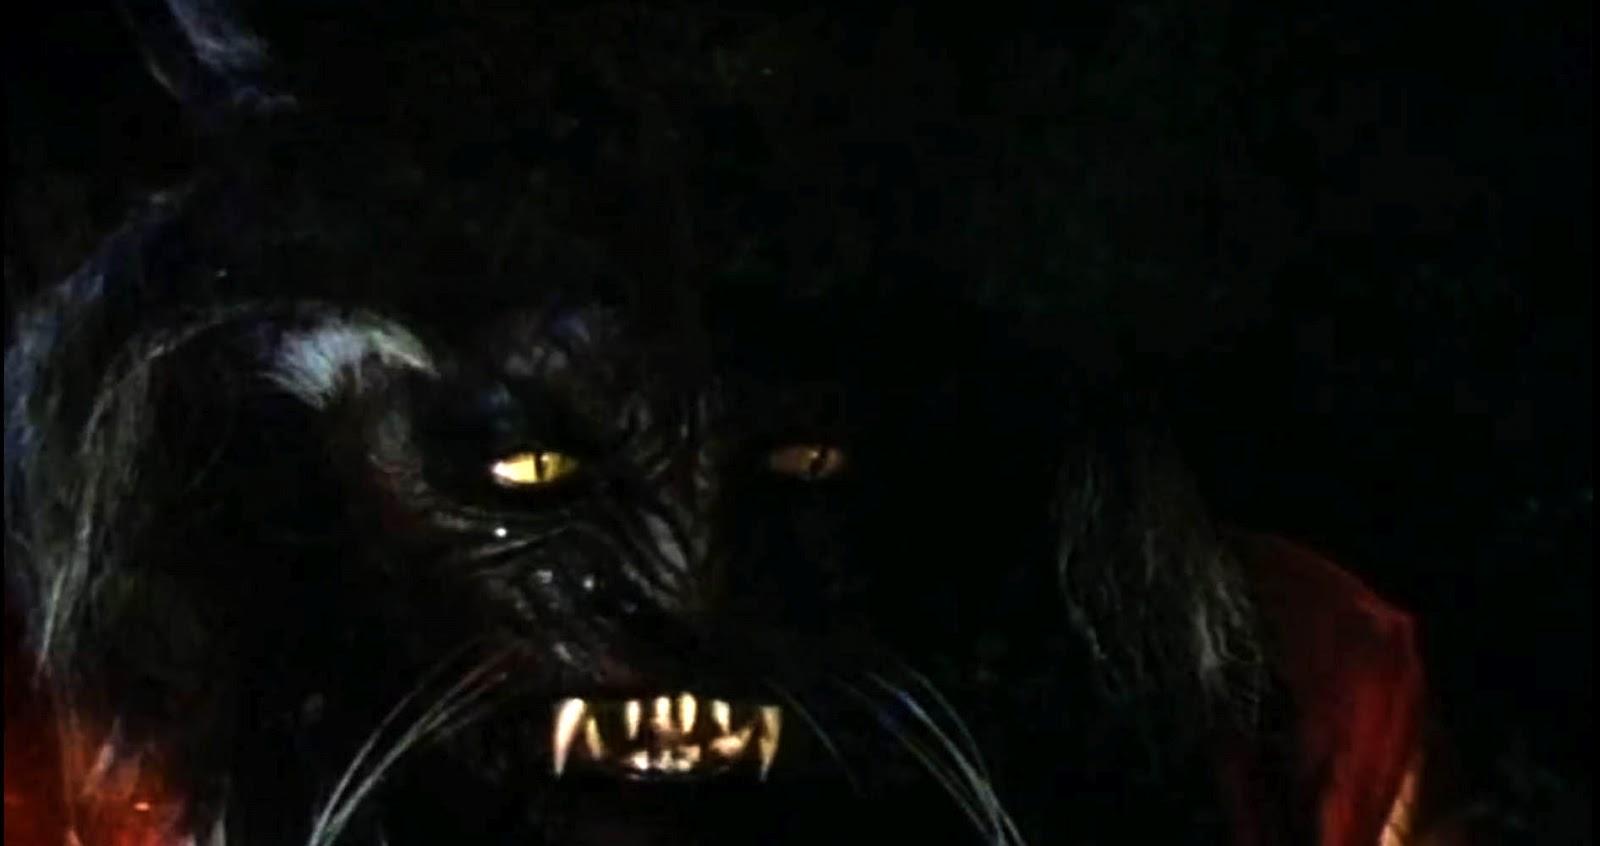 http://2.bp.blogspot.com/-17pwTB1QaDo/UF8vAEIe_PI/AAAAAAAAOF8/H0uxI82gFoI/s1600/thriller+-+werewolf.jpg